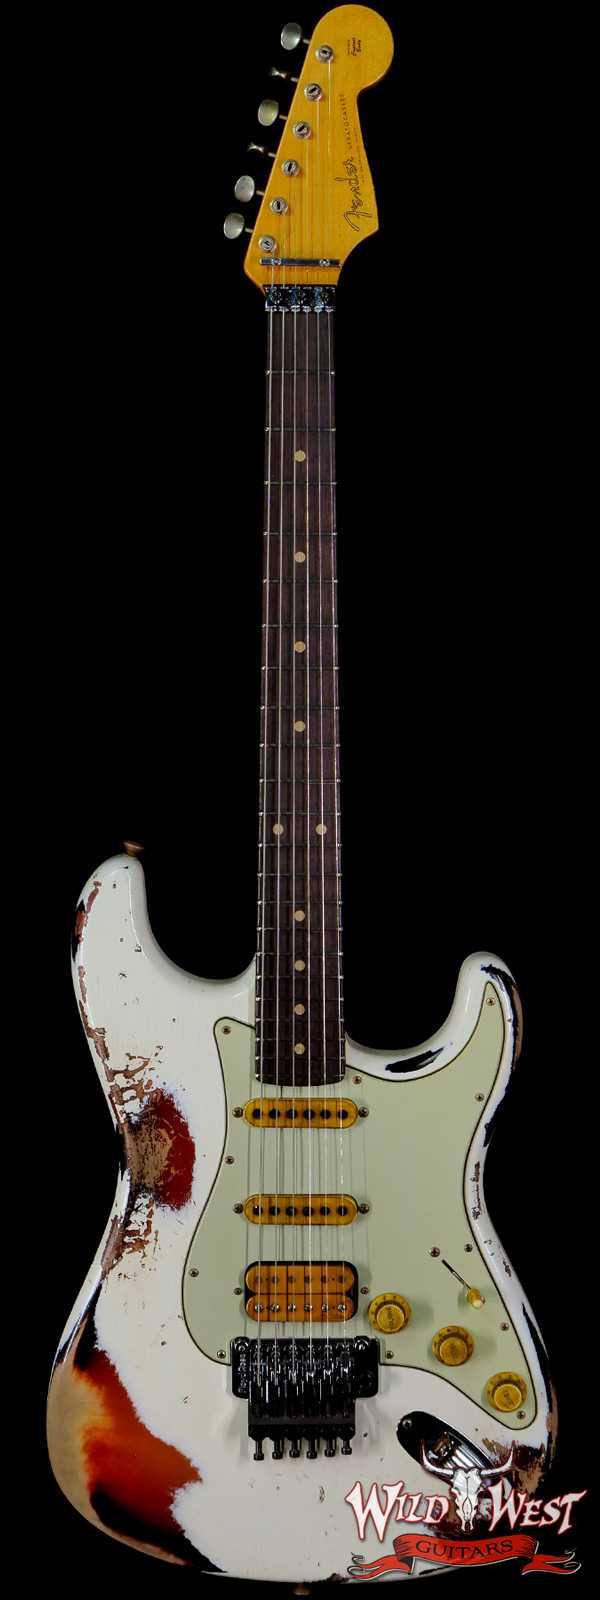 Fender Custom Shop Wild West White Lightning Stratocaster HSS Floyd Rose Rosewood Board 22 Frets Heavy Relic 3 Tone Sunburst